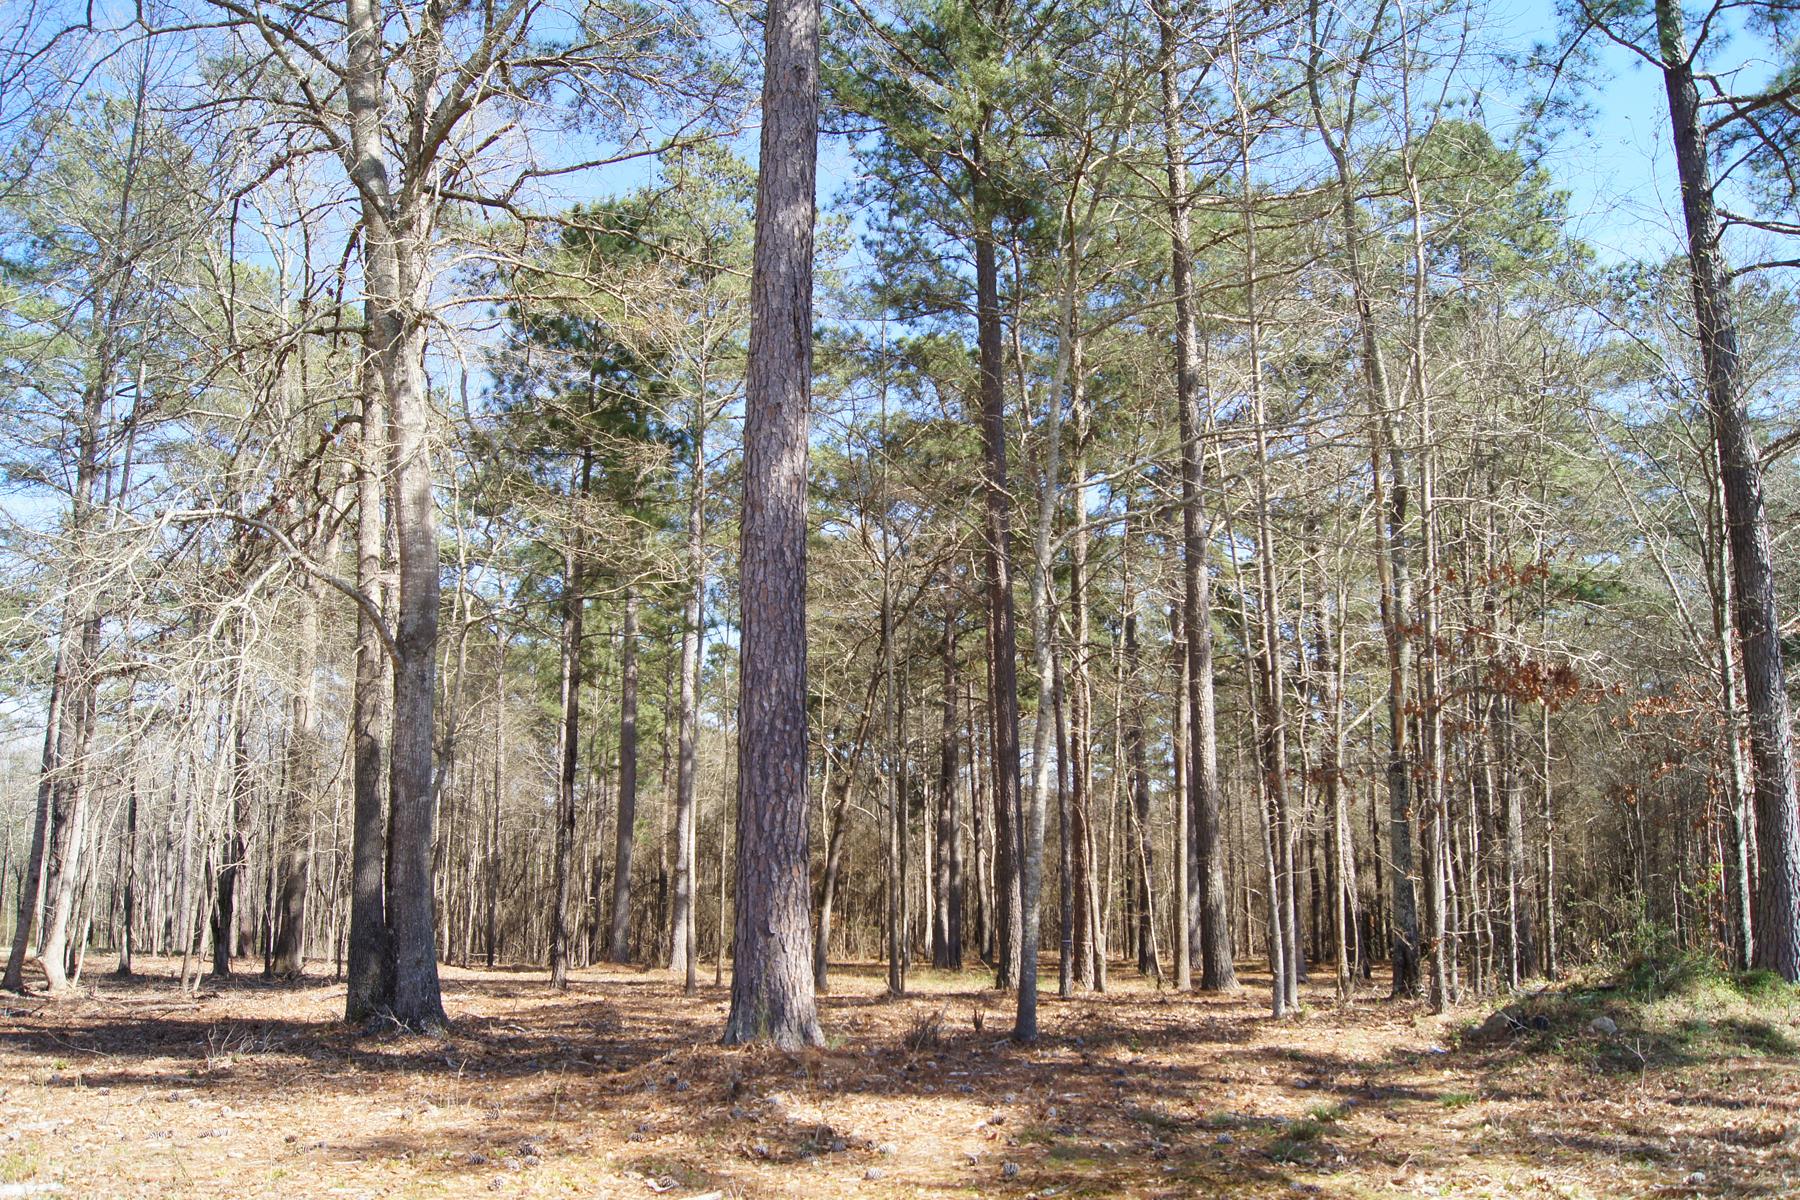 Land for Sale at Nine Acre Lot In Popular Whisper Creek Near Pinewood Studios 280 Honey Lane, Fayetteville, Georgia 30214 United States